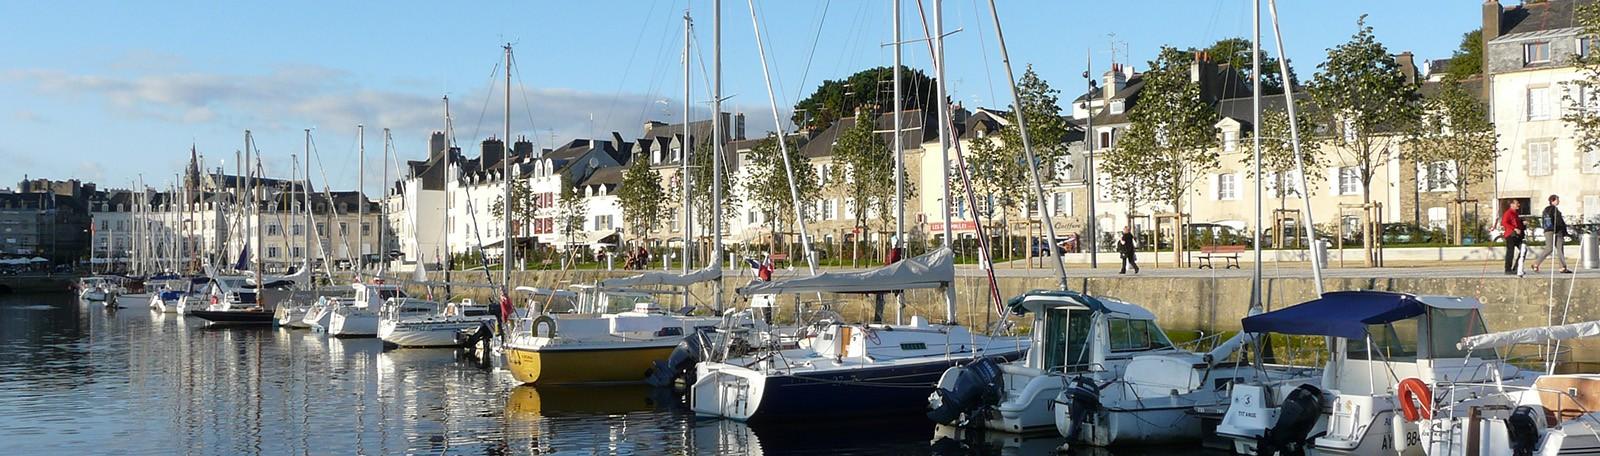 Parking Port - Parkeren in Vannes | Q-Park